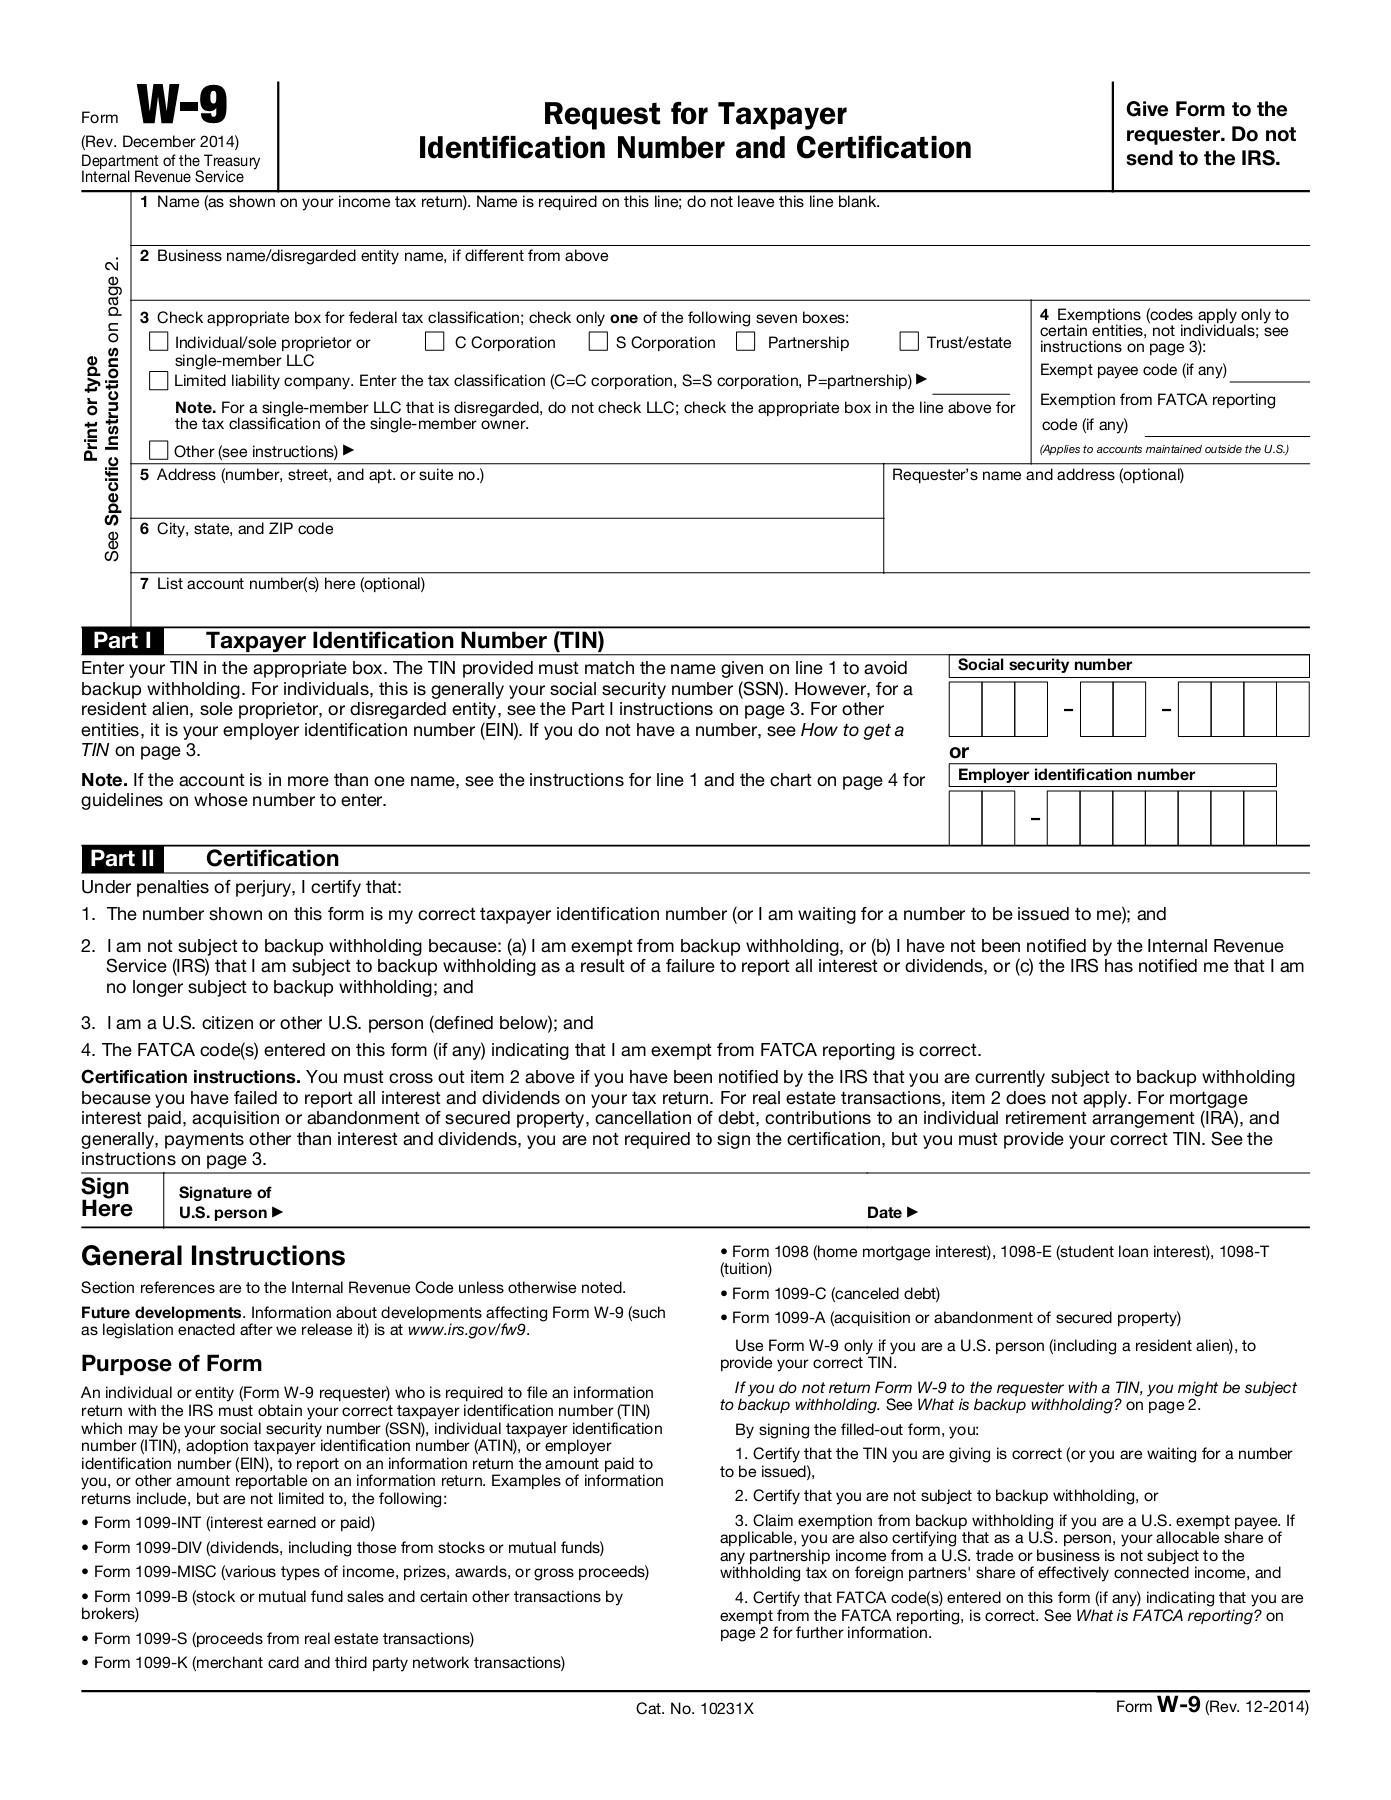 Irs.gov W9 Form 2014